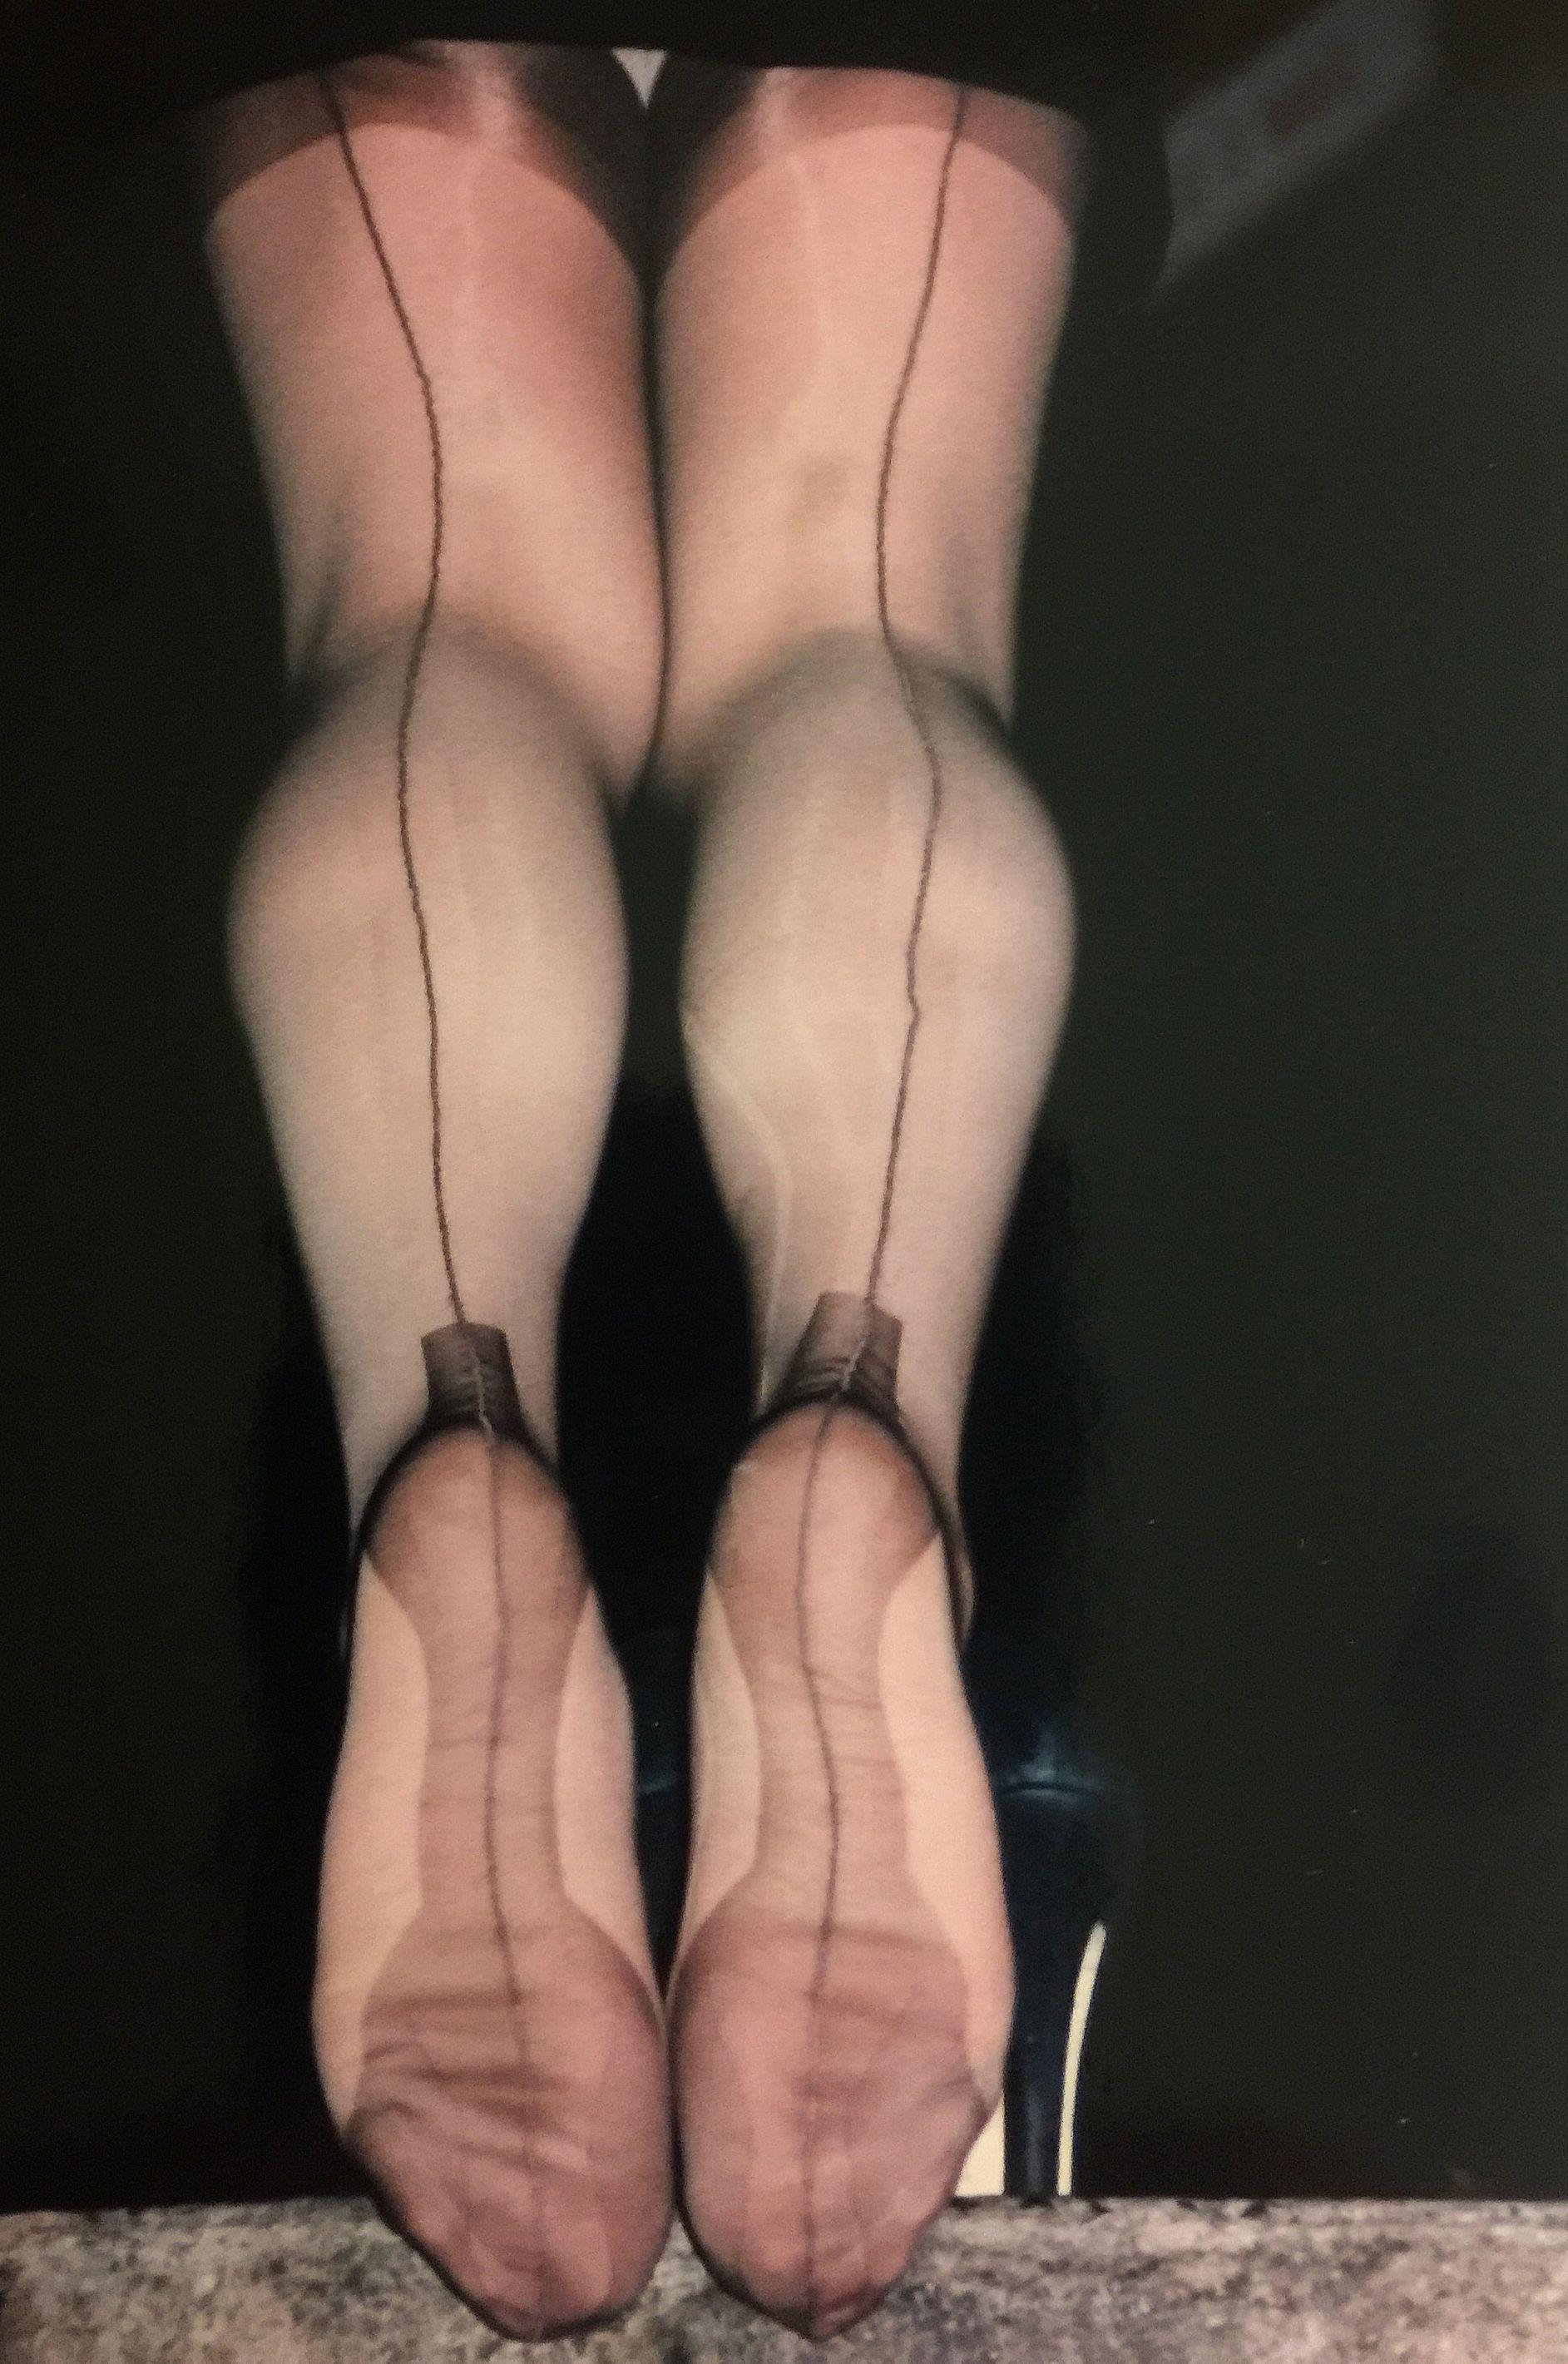 Nylon Xtreme [9K] 🔞 on Twitter: In car #legs of